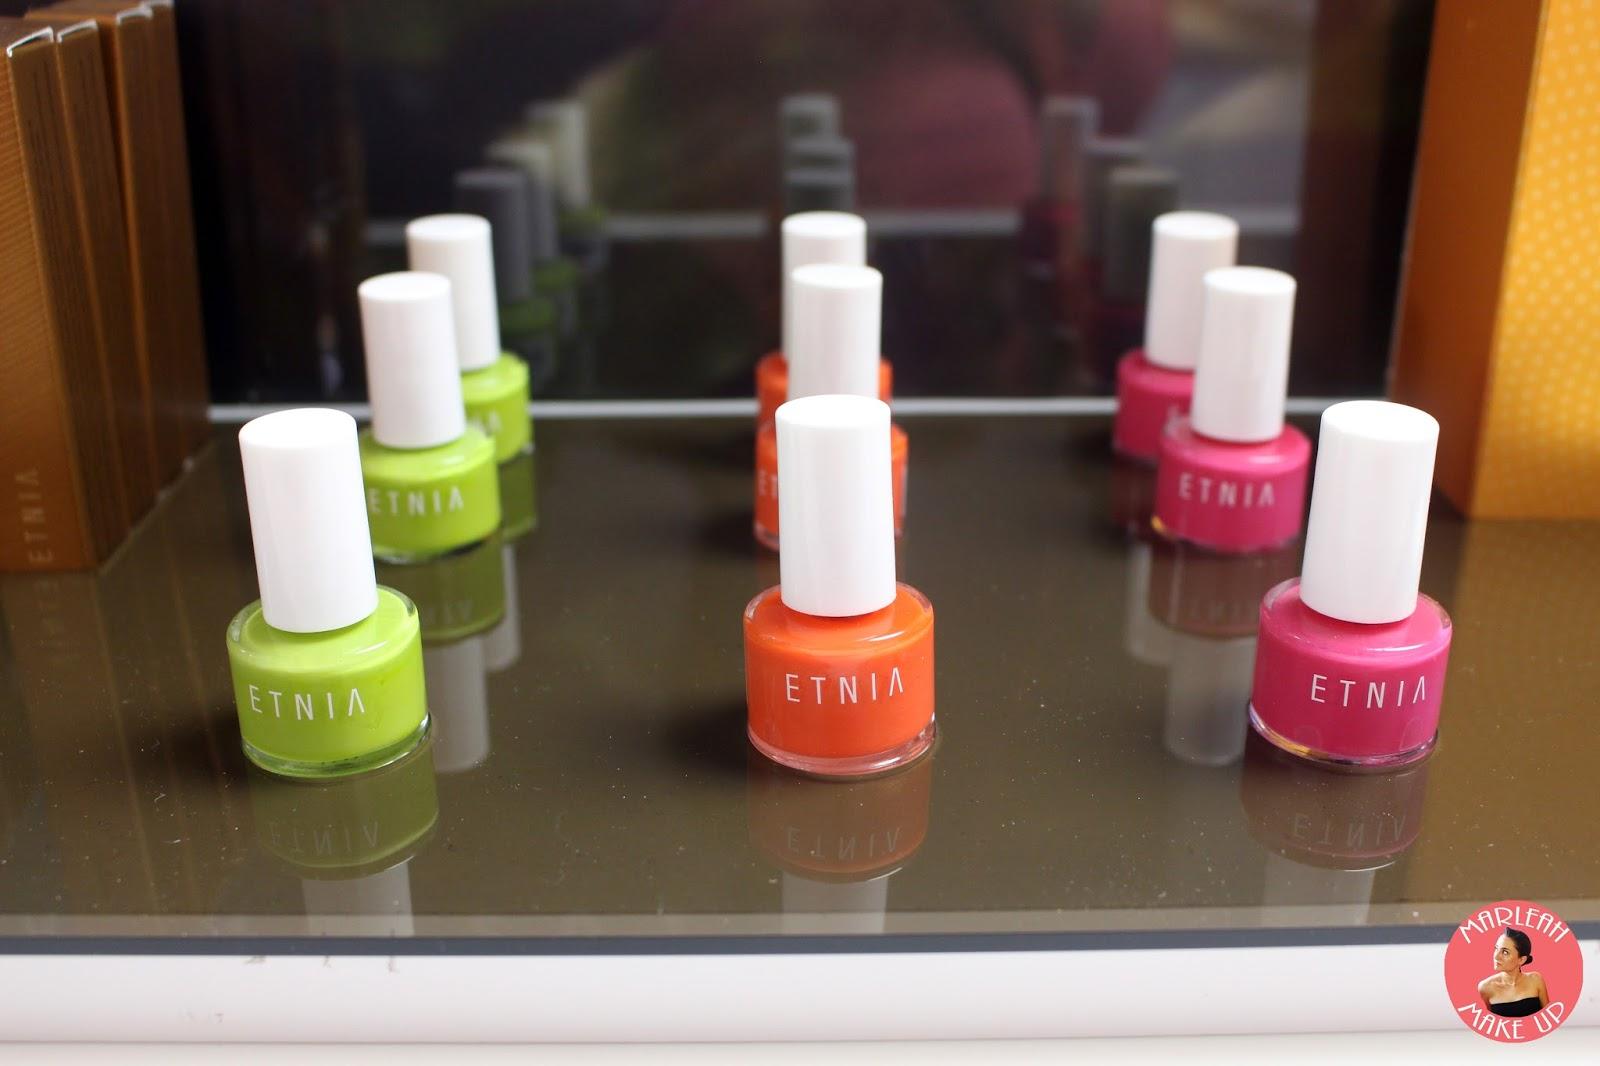 colección SAMOA Etnia Cosmetics collection spring summer primavera verano maquillaje makeup low cost colour colorful evento event new in